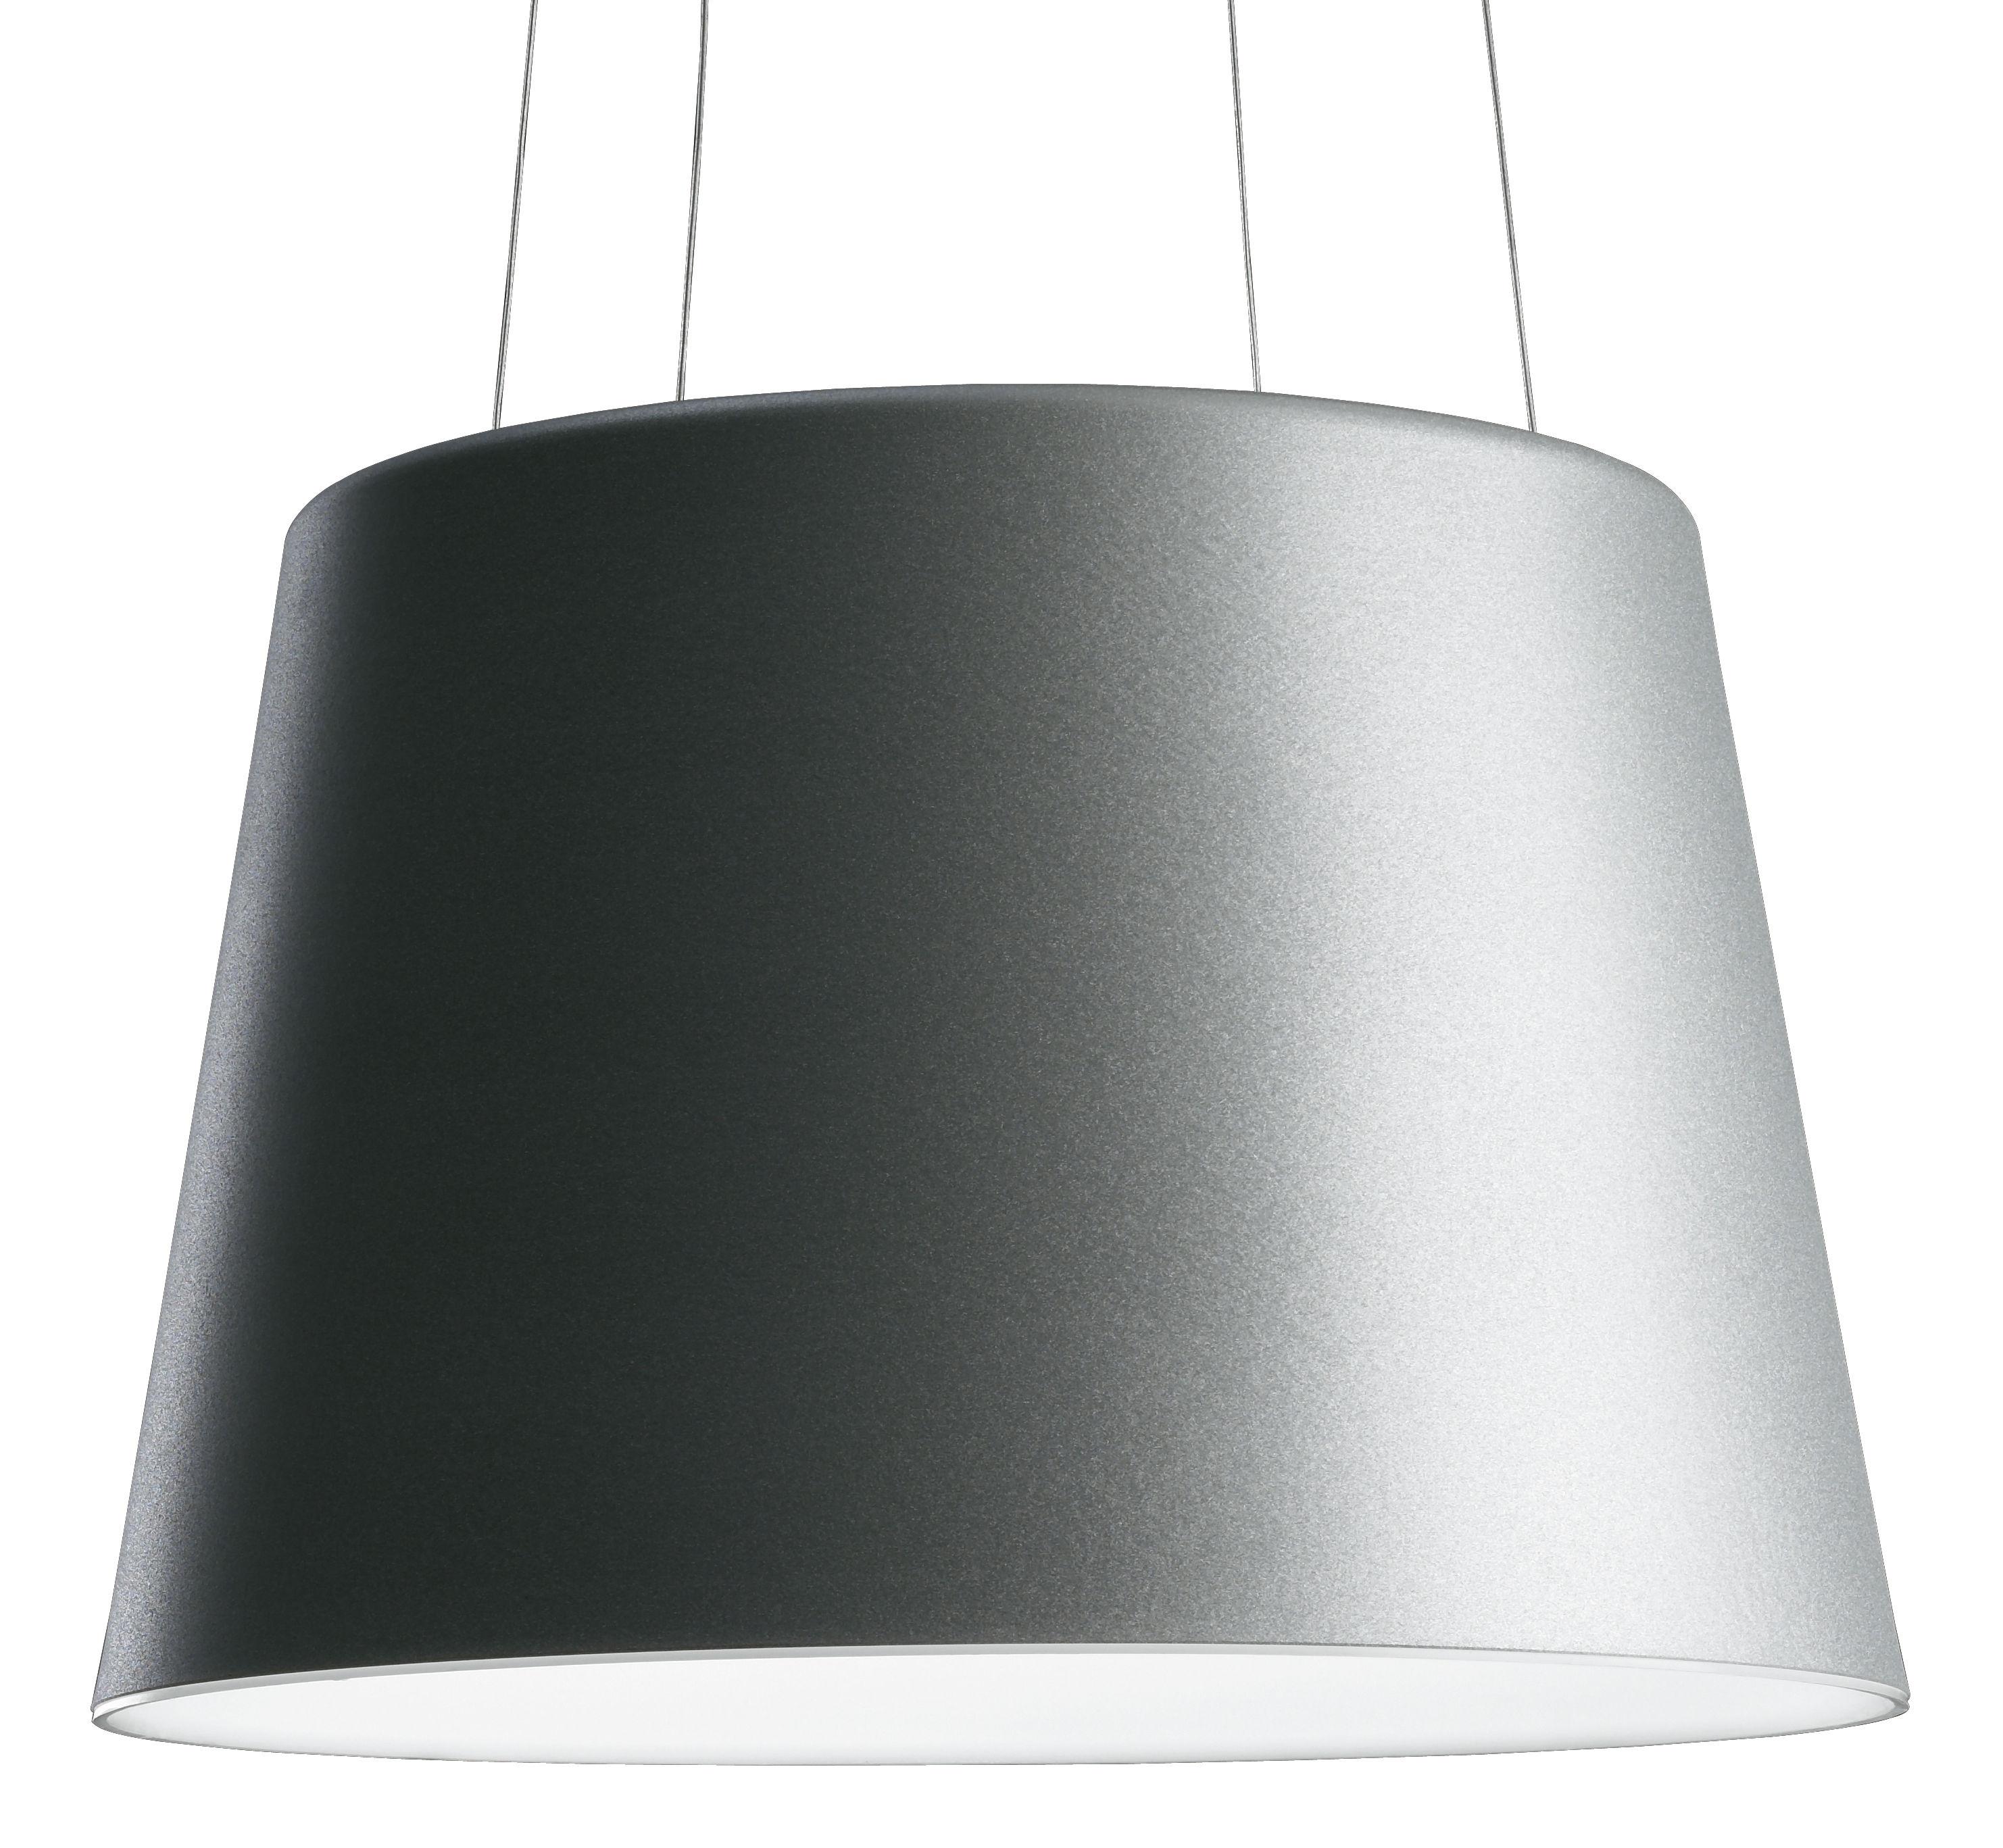 Aurea Pendant Aluminiun by Fontana Arte | Made In Design UK